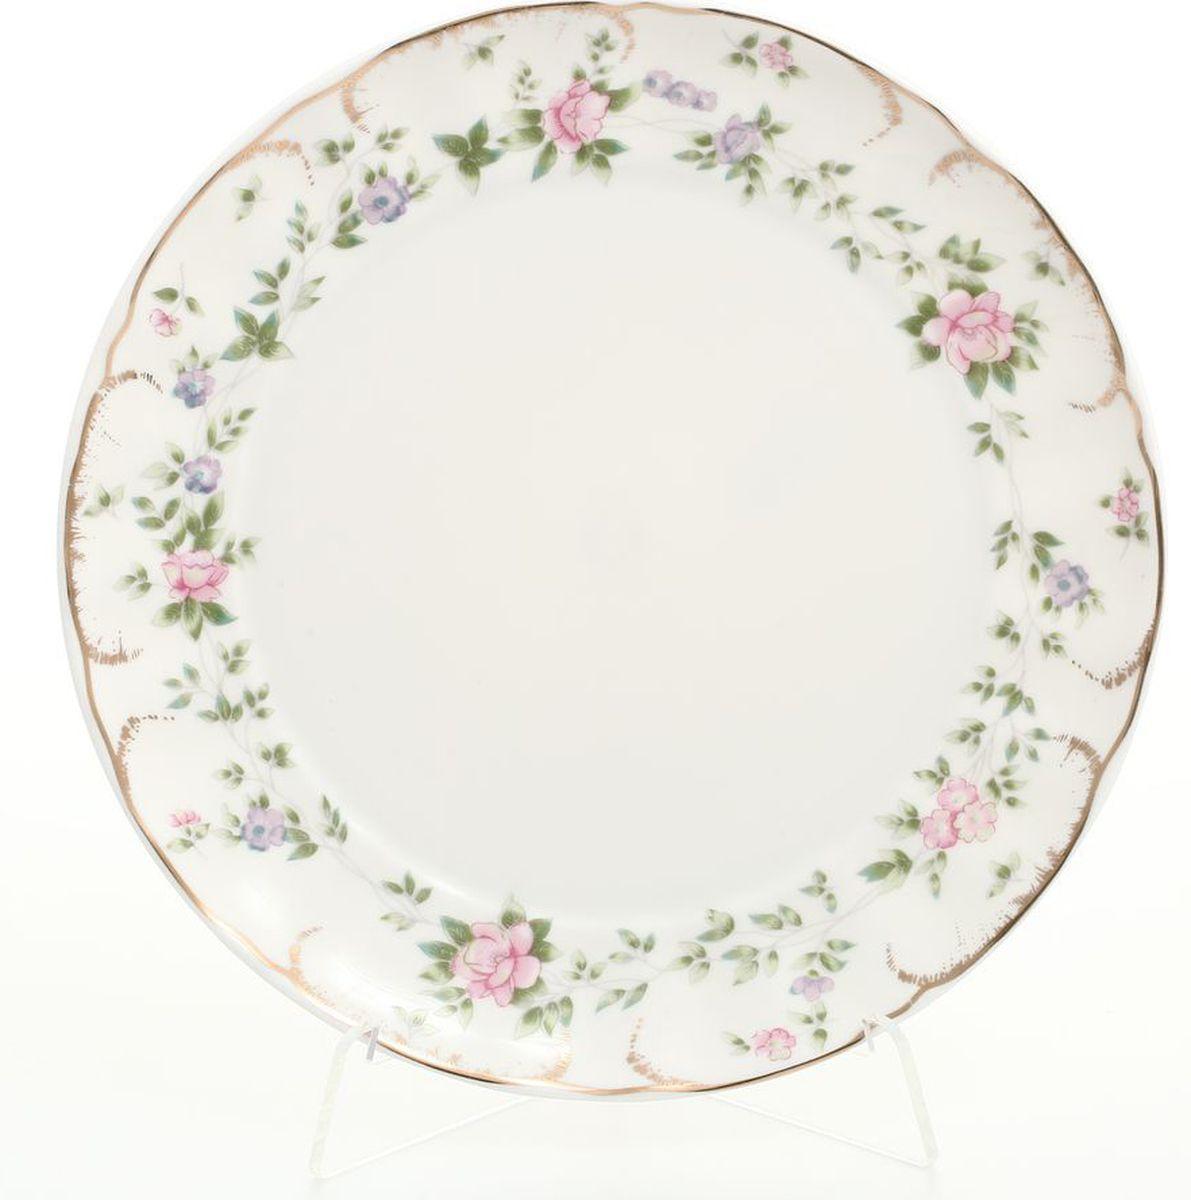 Тарелка Royal Classics, 35616, белый, диаметр 19 см, 6 шт